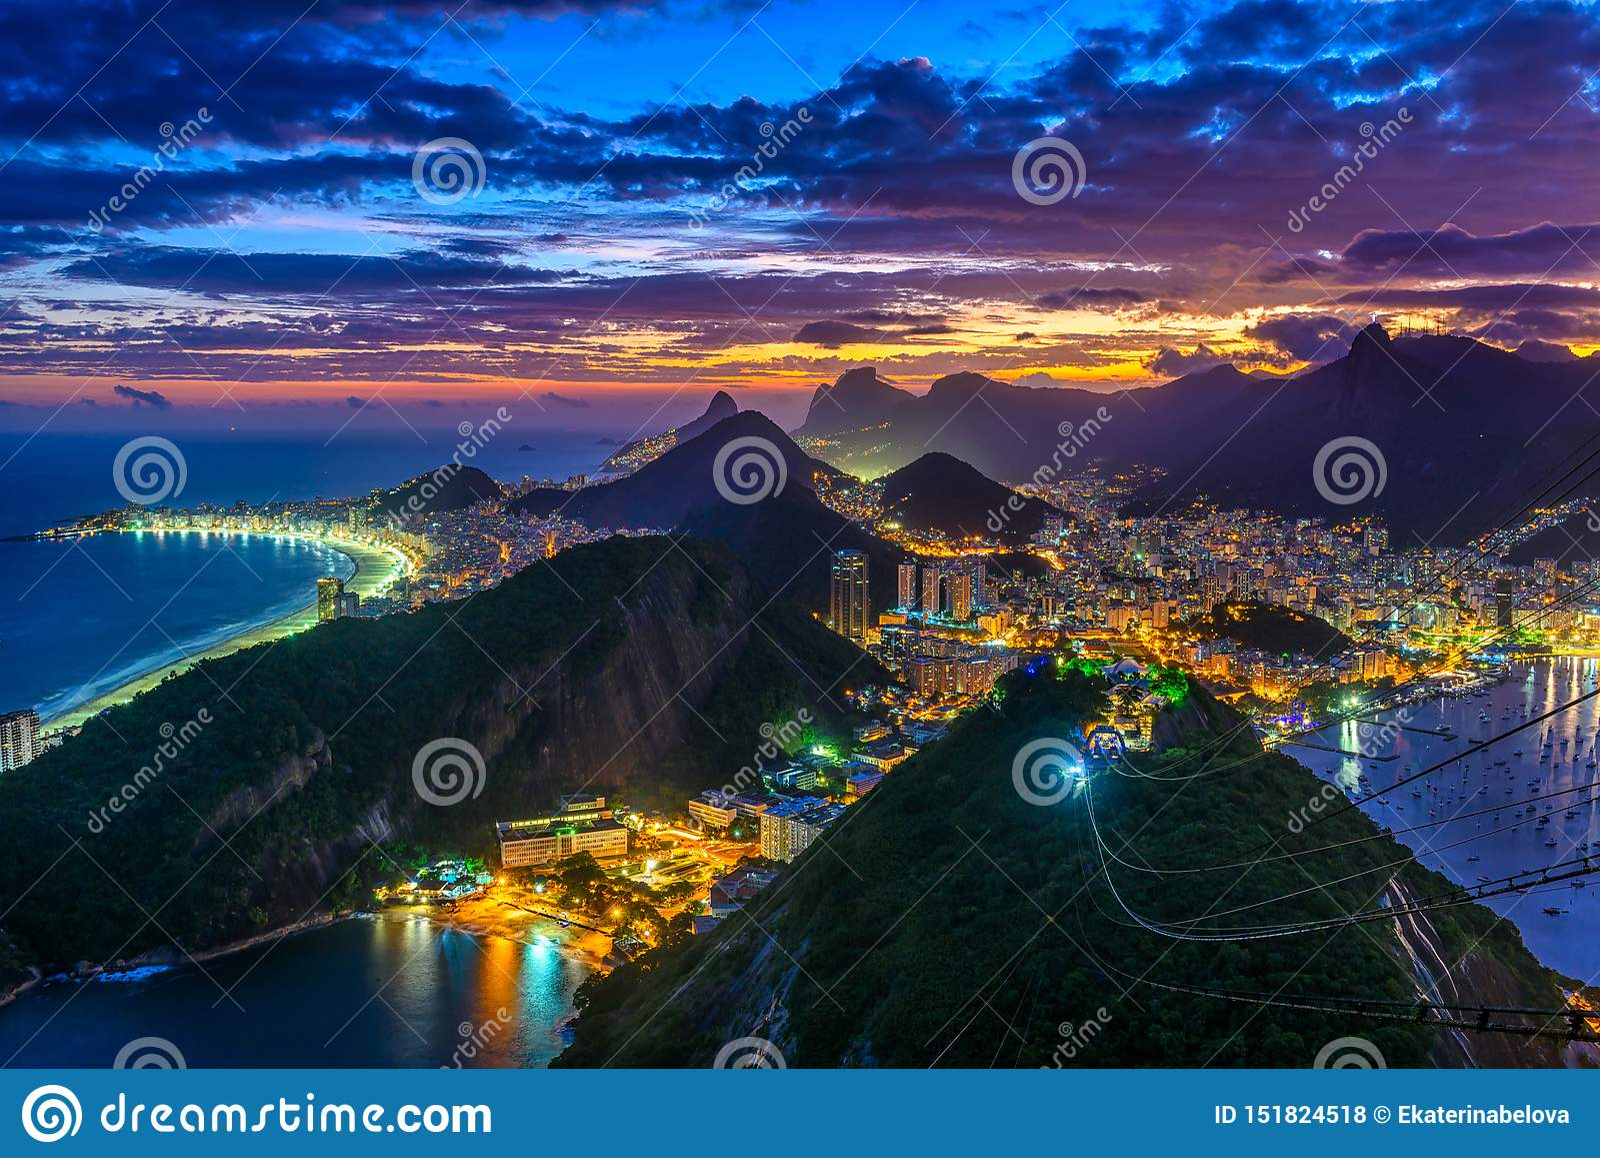 Sunset view of Copacabana, Corcovado, Urca and Botafogo in Rio de Janeiro